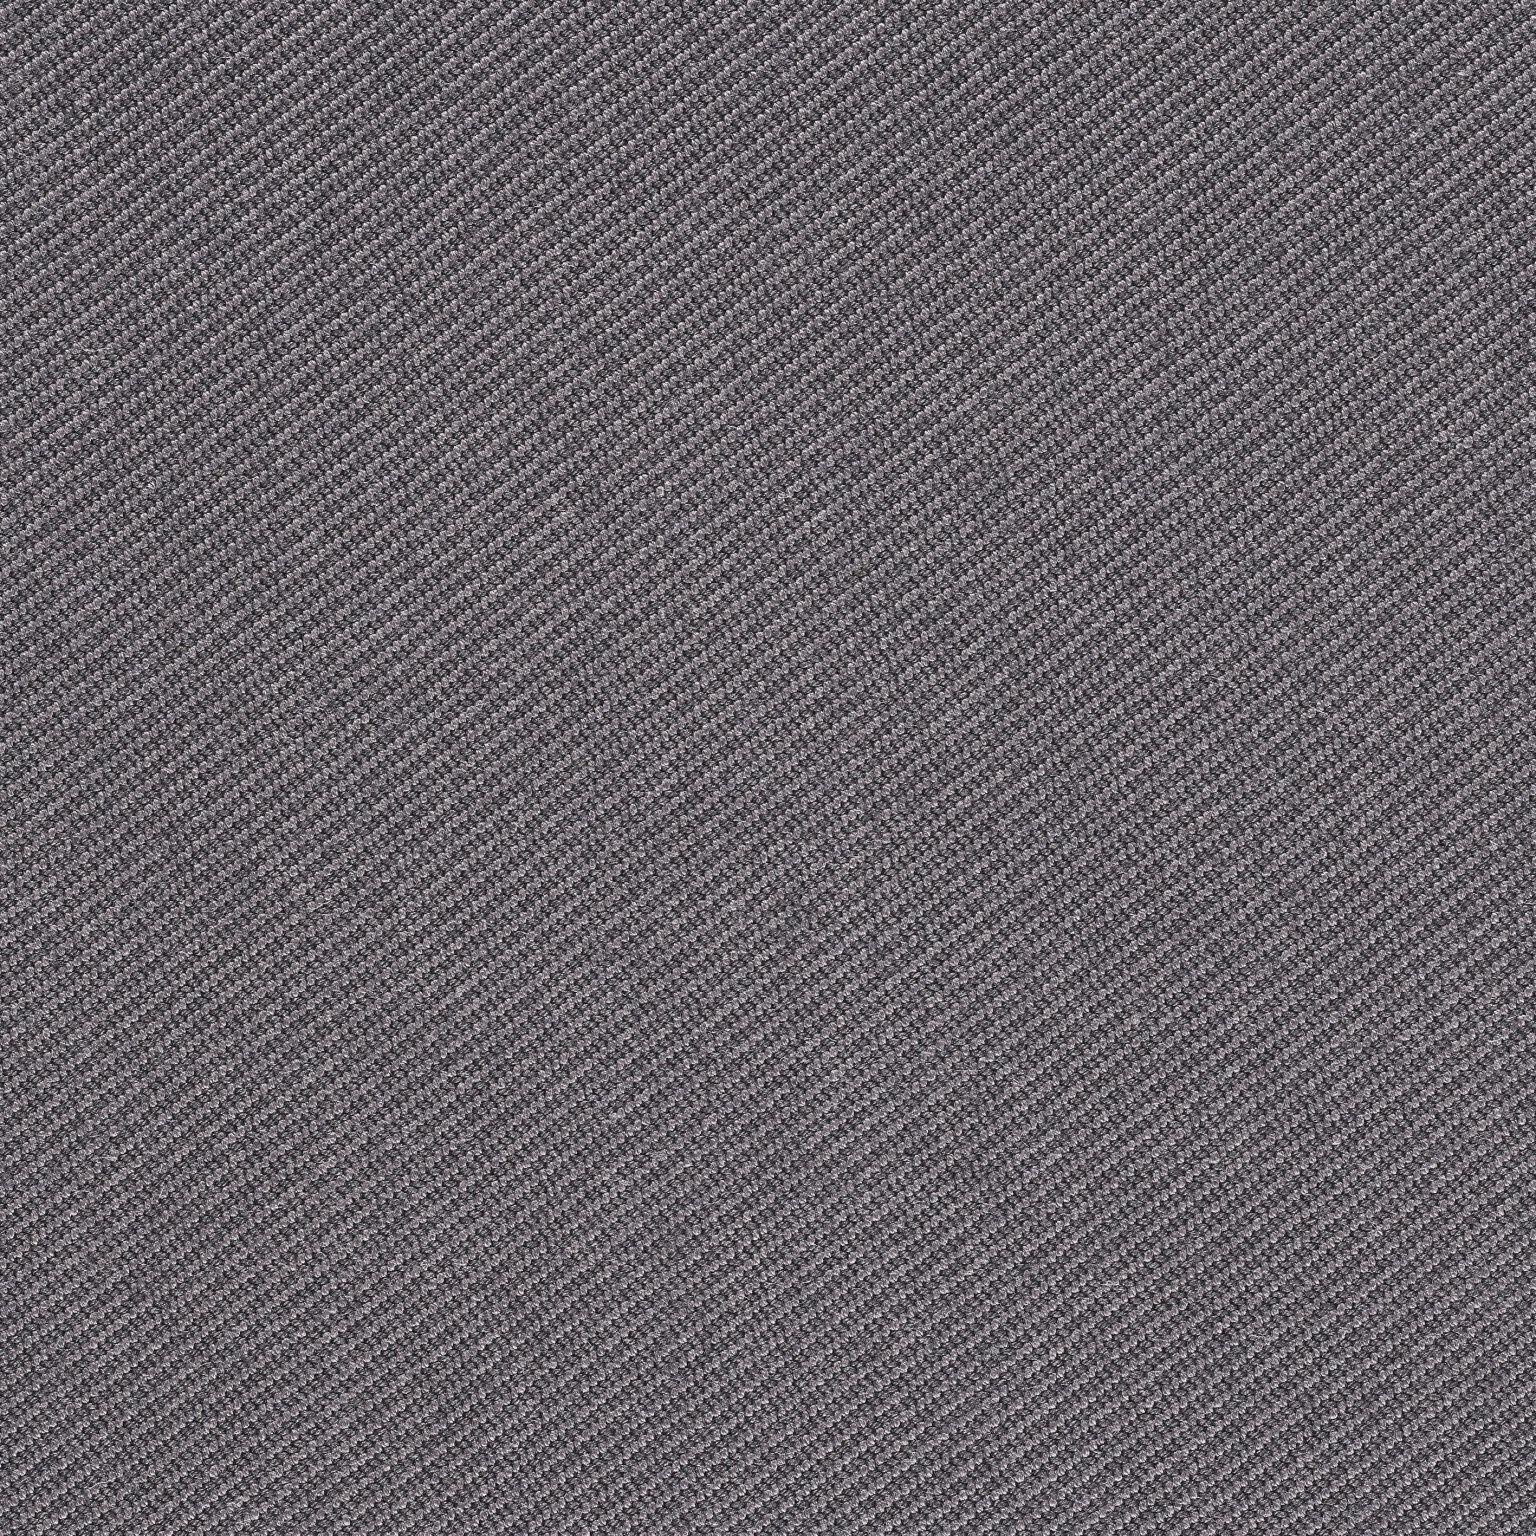 Kvadrat > Twill Weave 0160